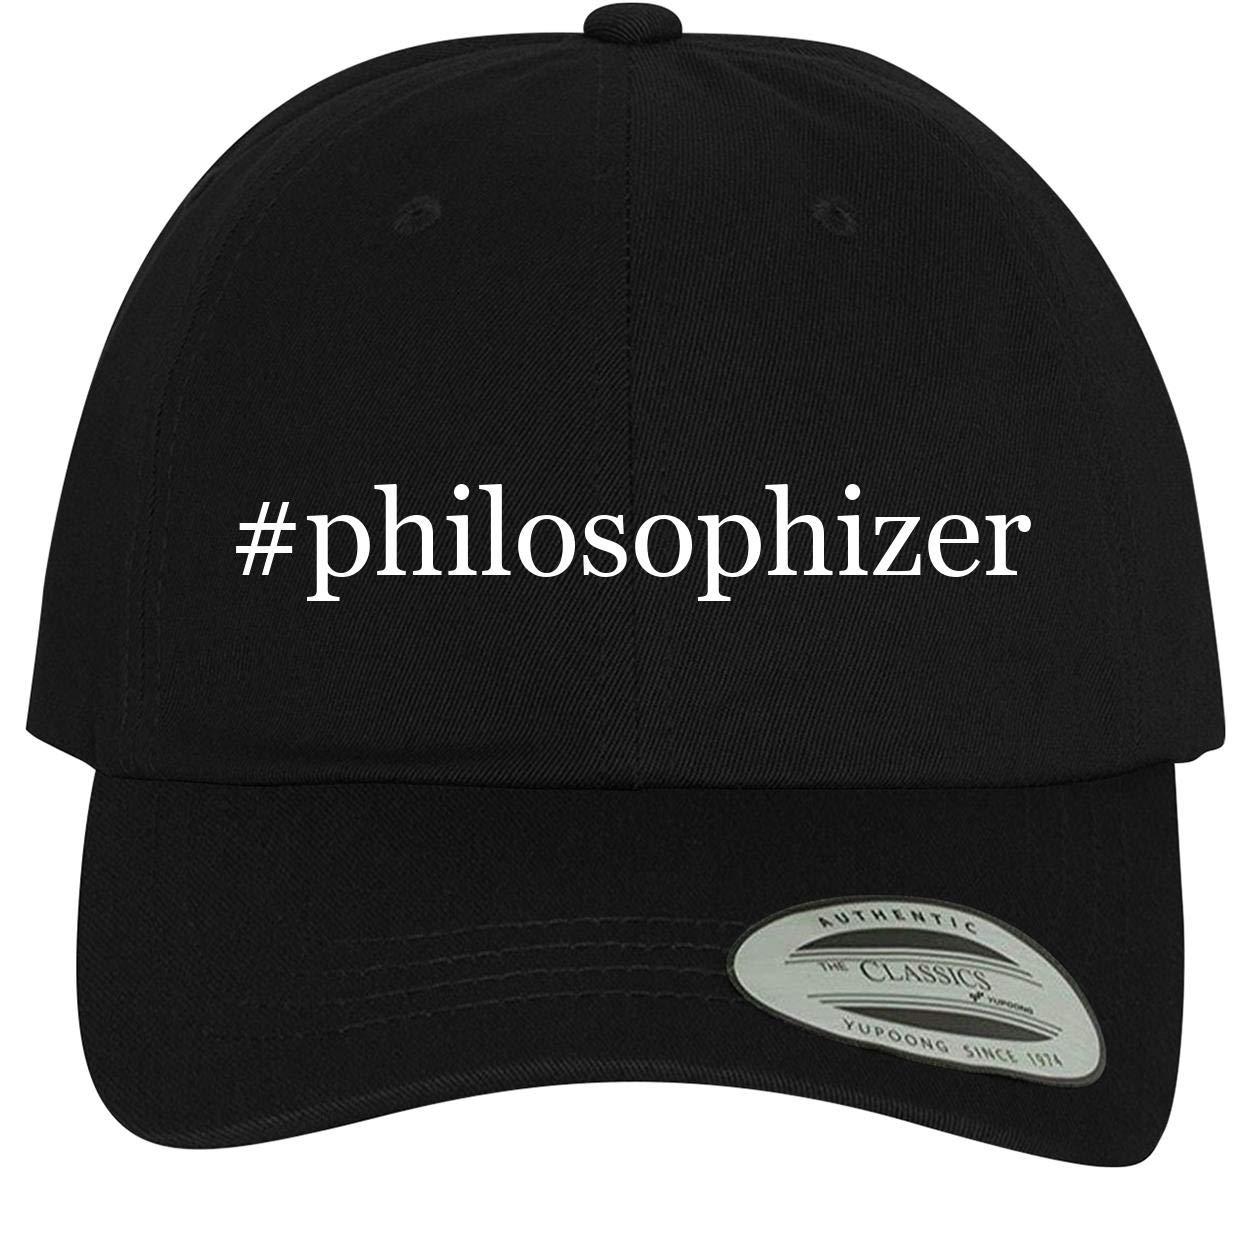 Comfortable Dad Hat Baseball Cap BH Cool Designs #Philosophizer